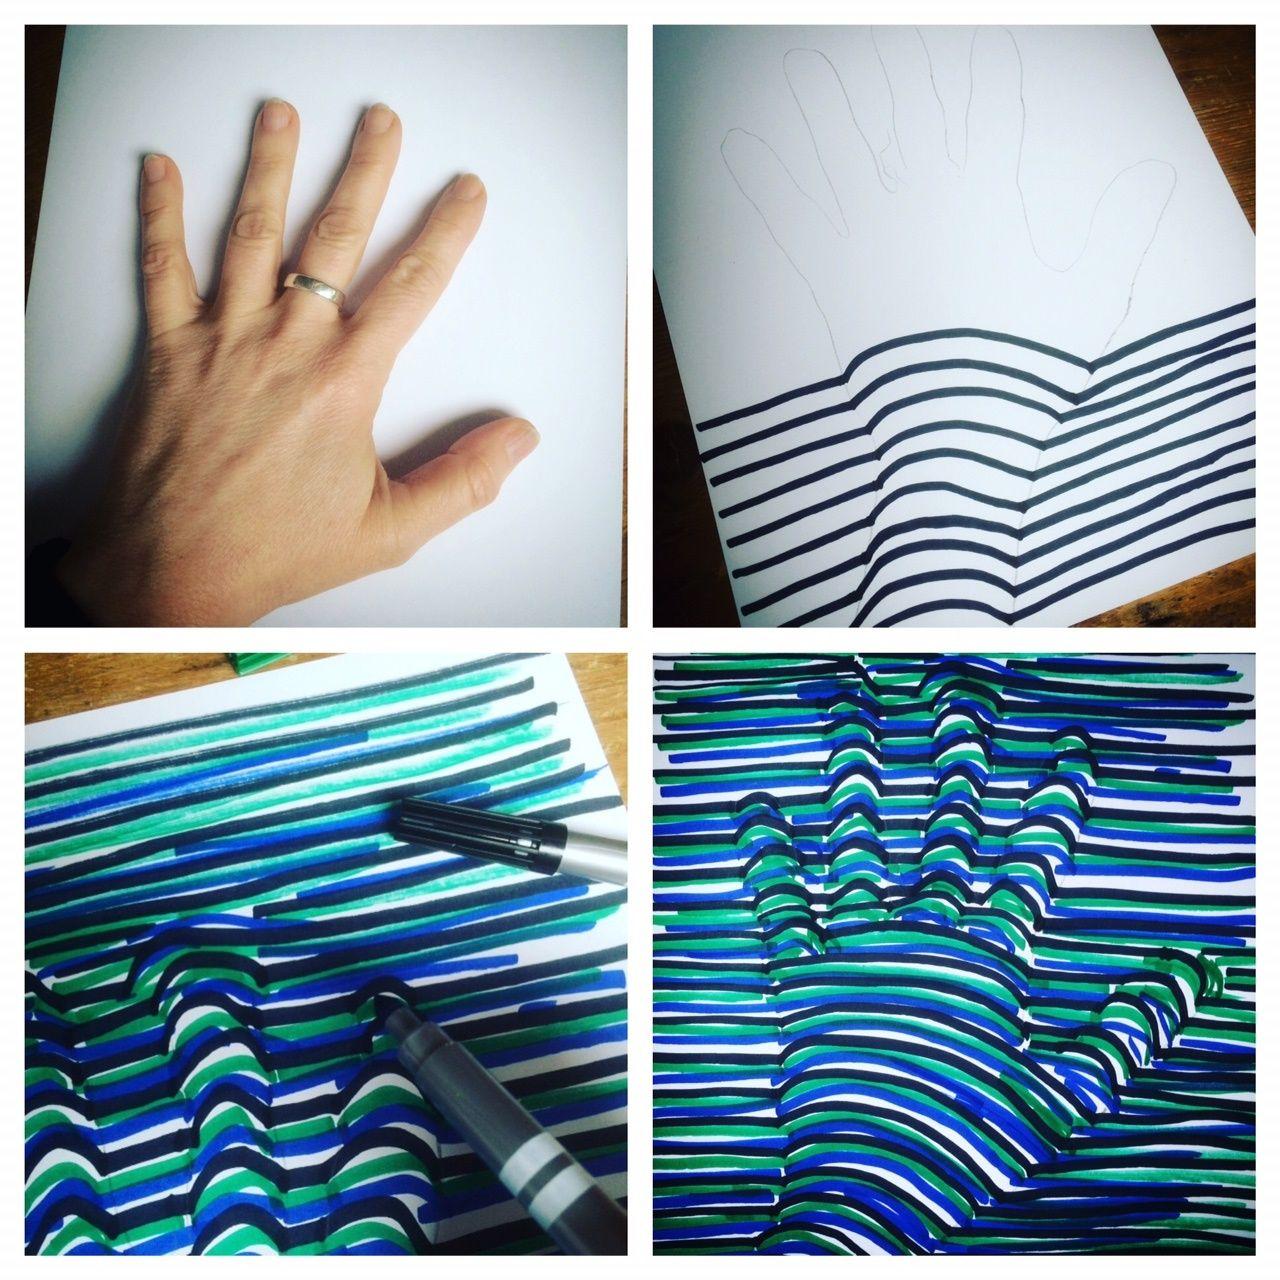 3d Hand Zeichnen Optische Täuschung Bilderanleitung Link